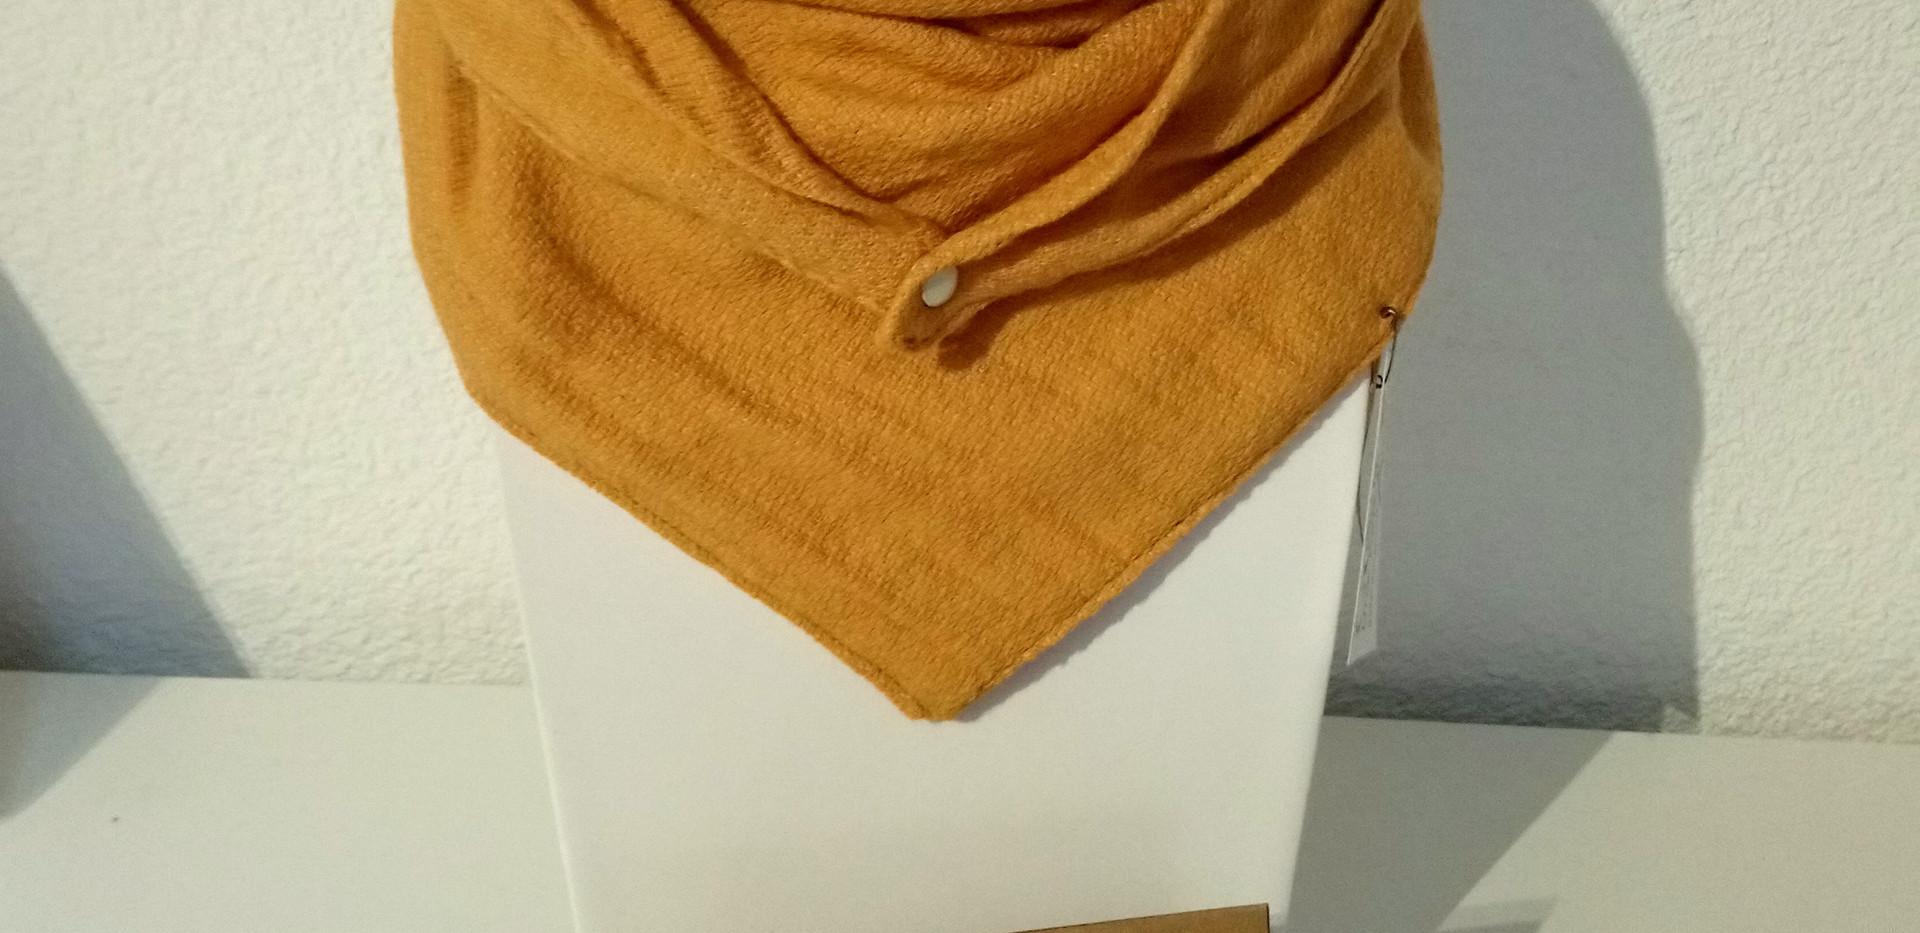 Foulard Astucieux Gcreativ Modèle Pigment